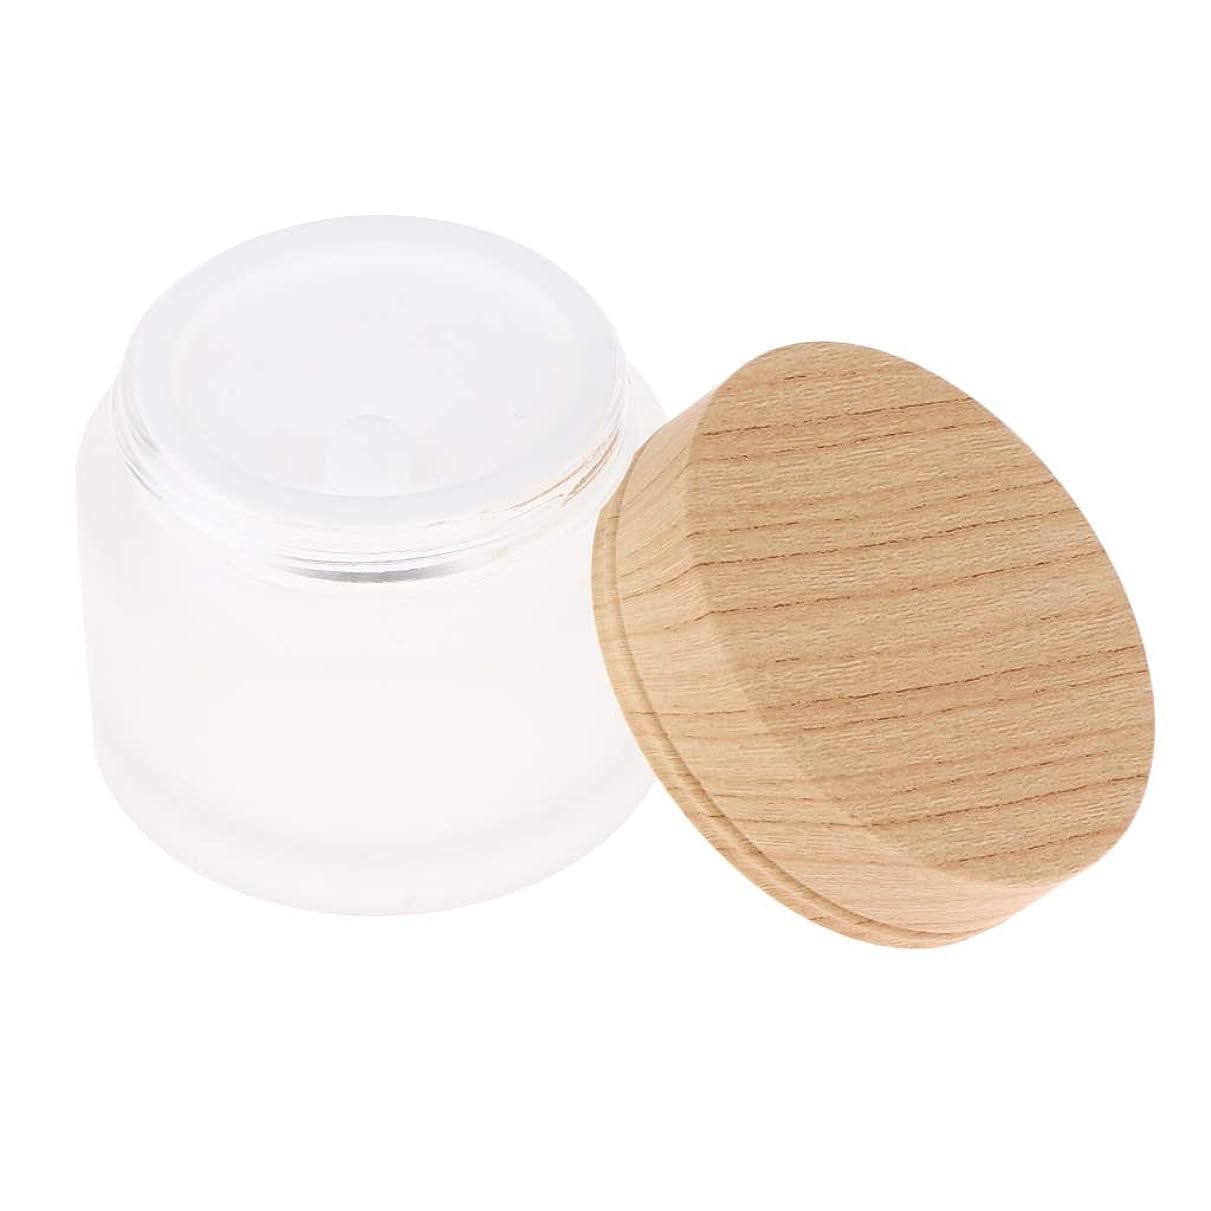 T TOOYFUL 2ピース 化粧ポット空 化粧品瓶 ローションクリーム コンテナマットクリア - 50g